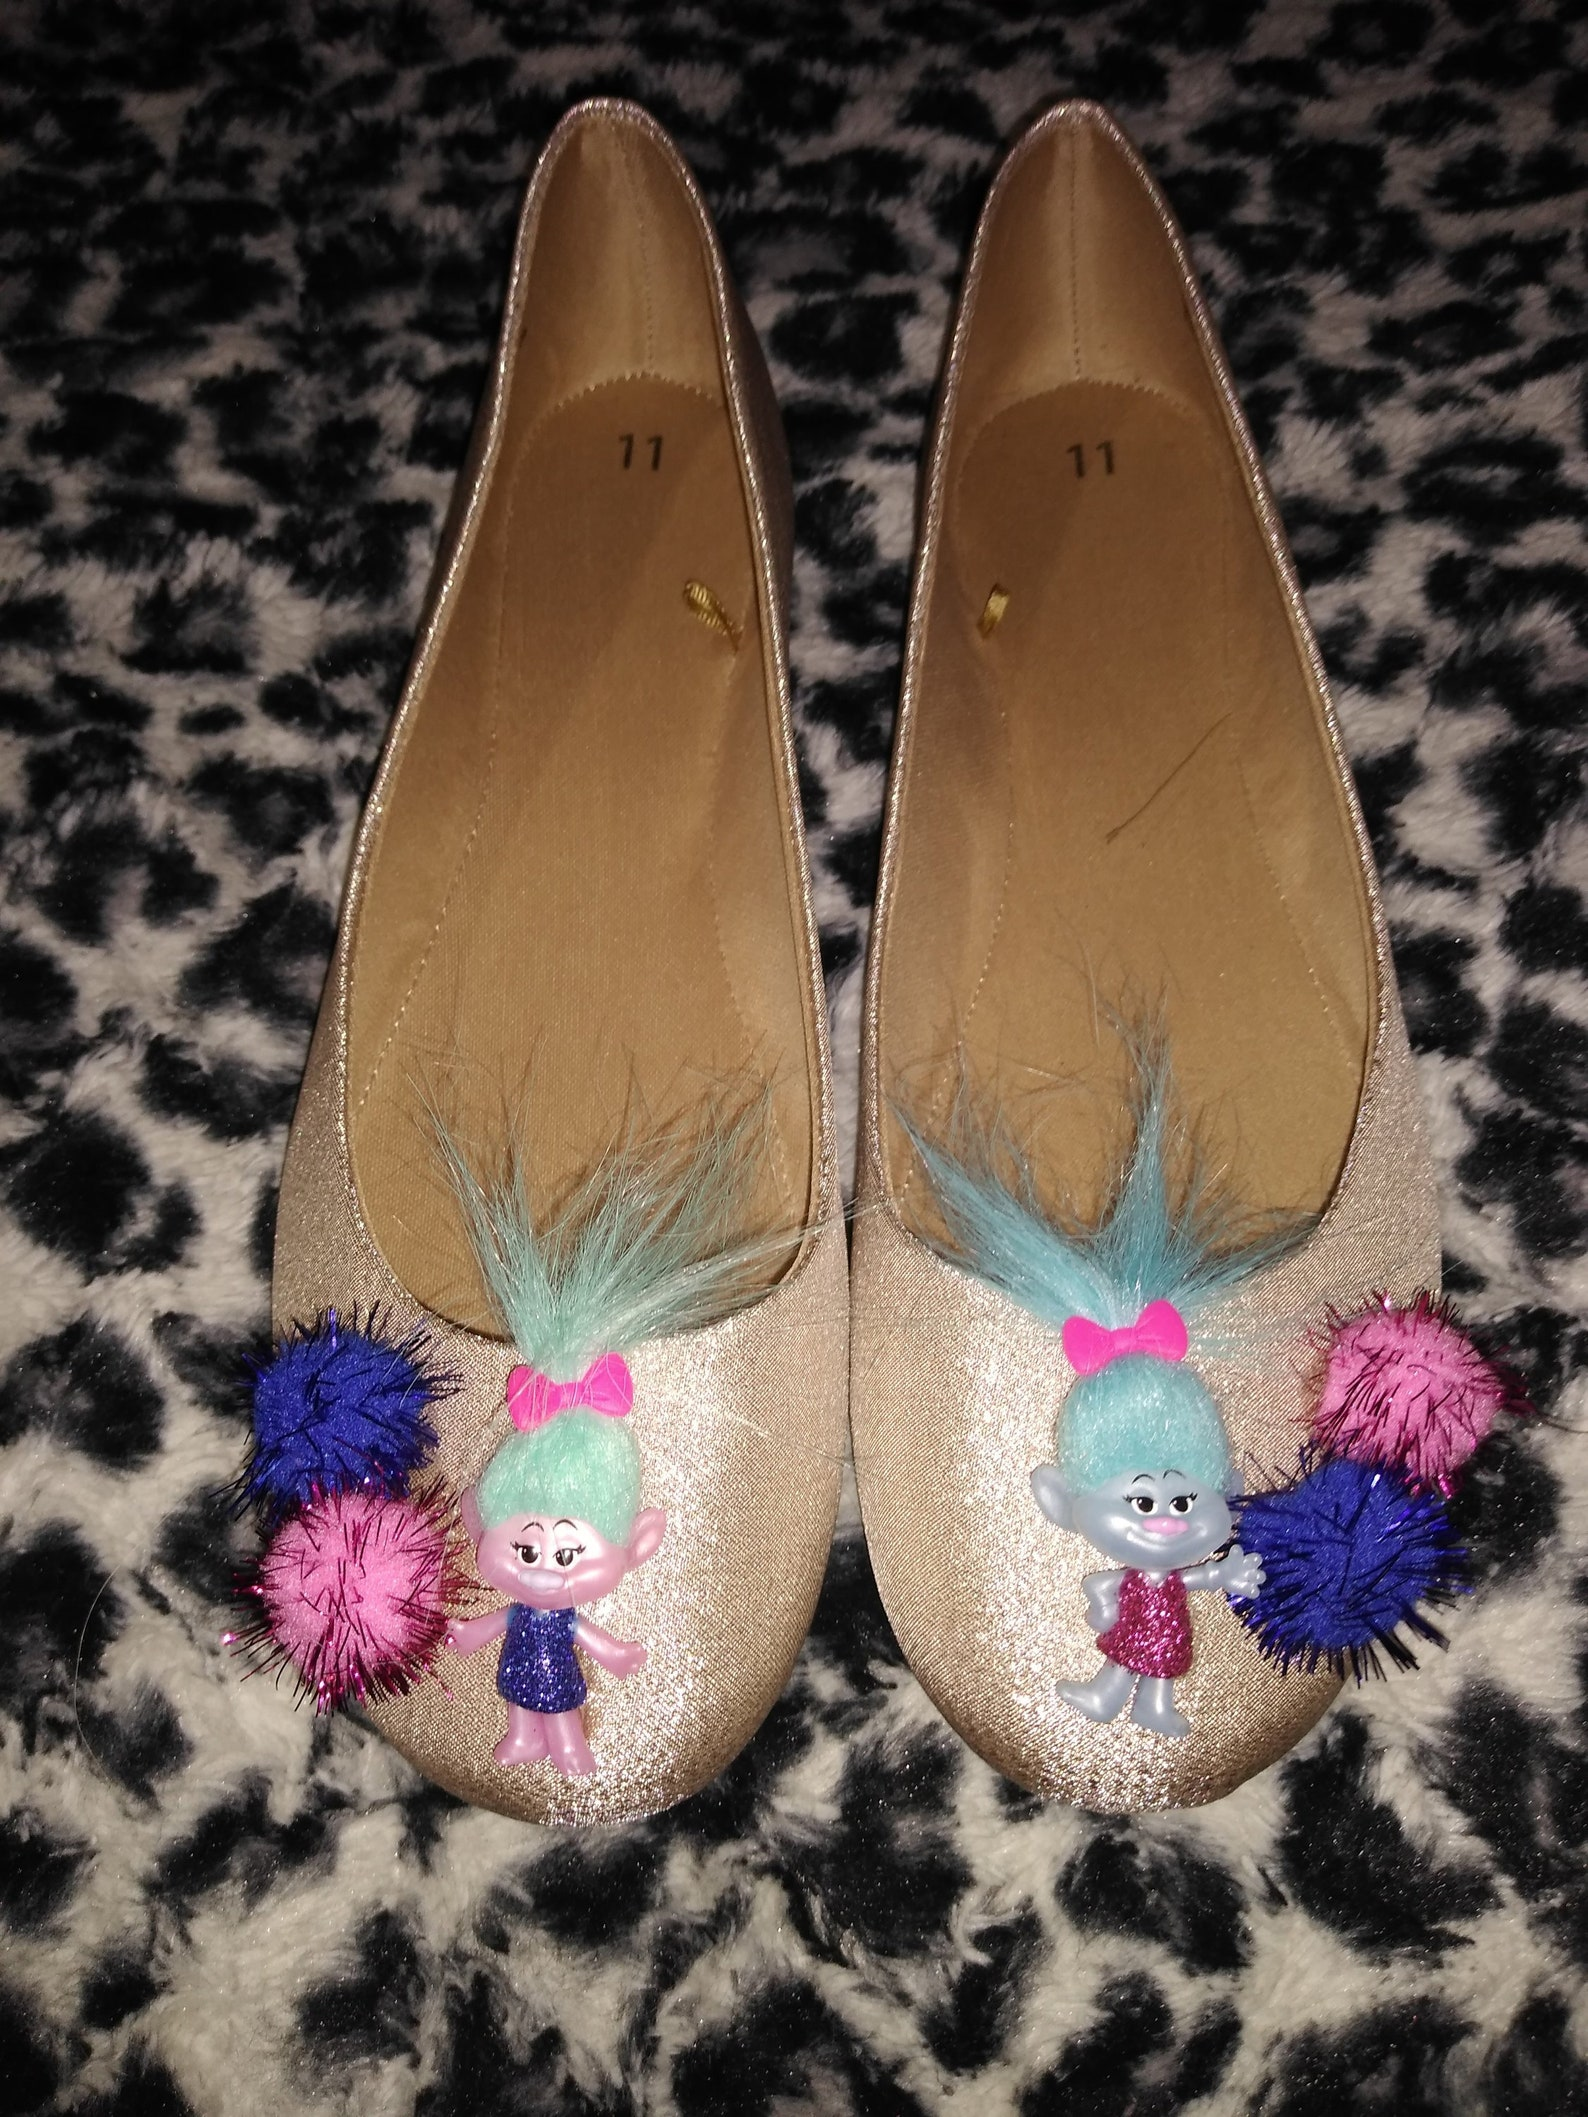 troll doll bling gold ballet flats shoes 11